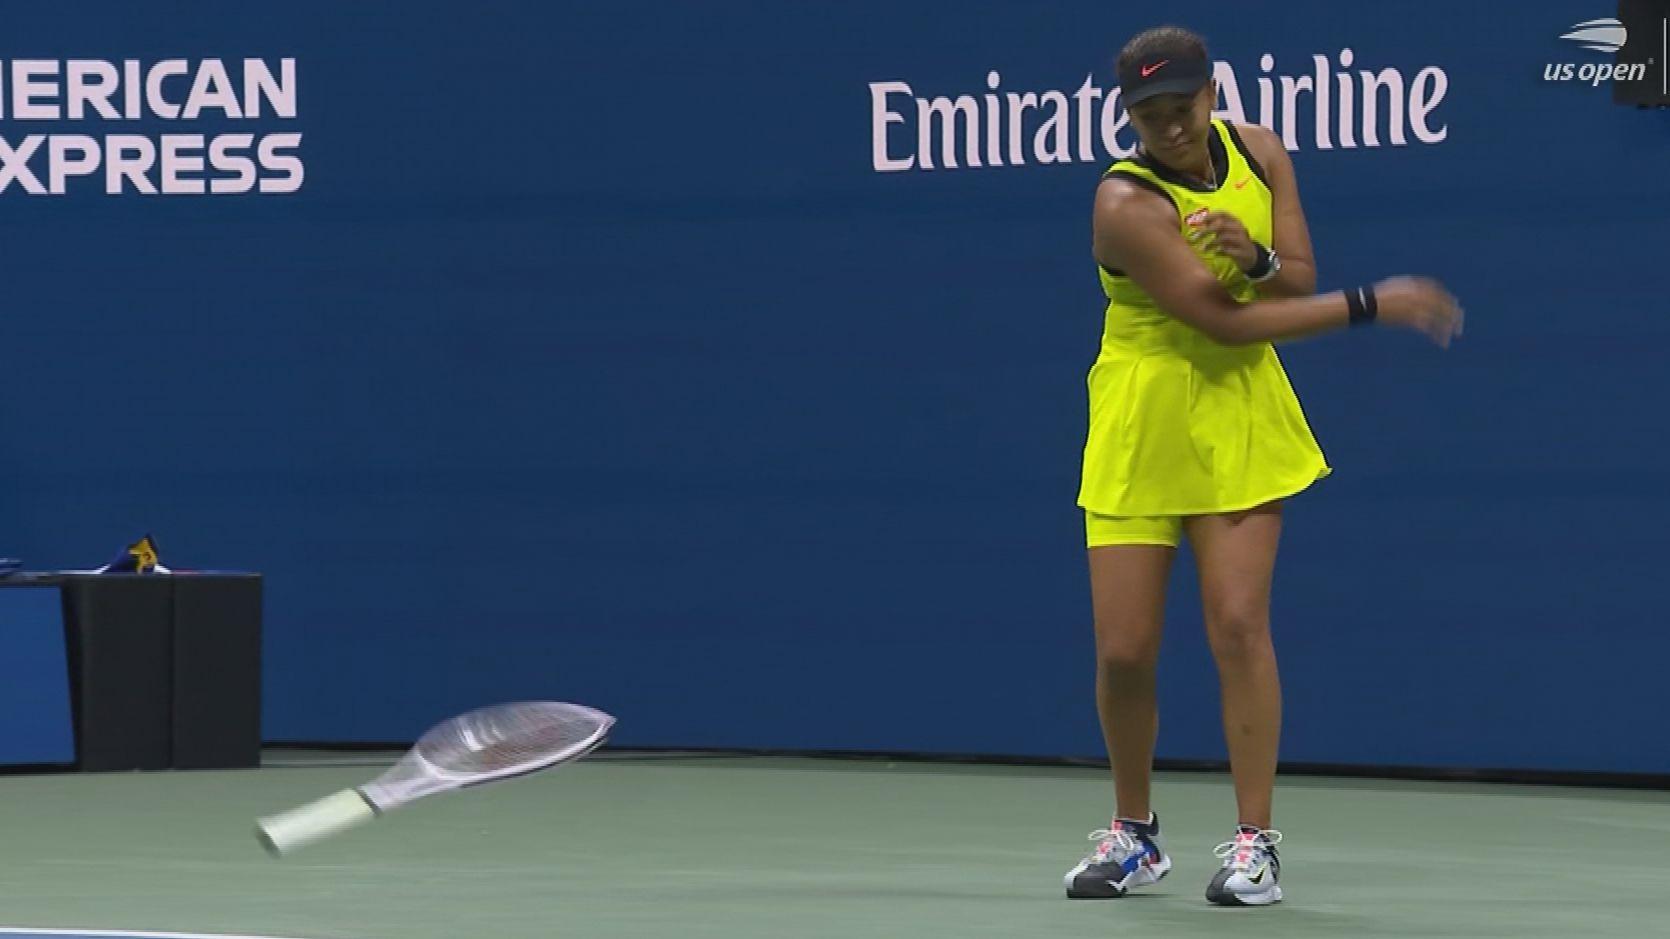 Teenage sensation Leylah Fernandez shocks frustrated Naomi Osaka in US Open upset